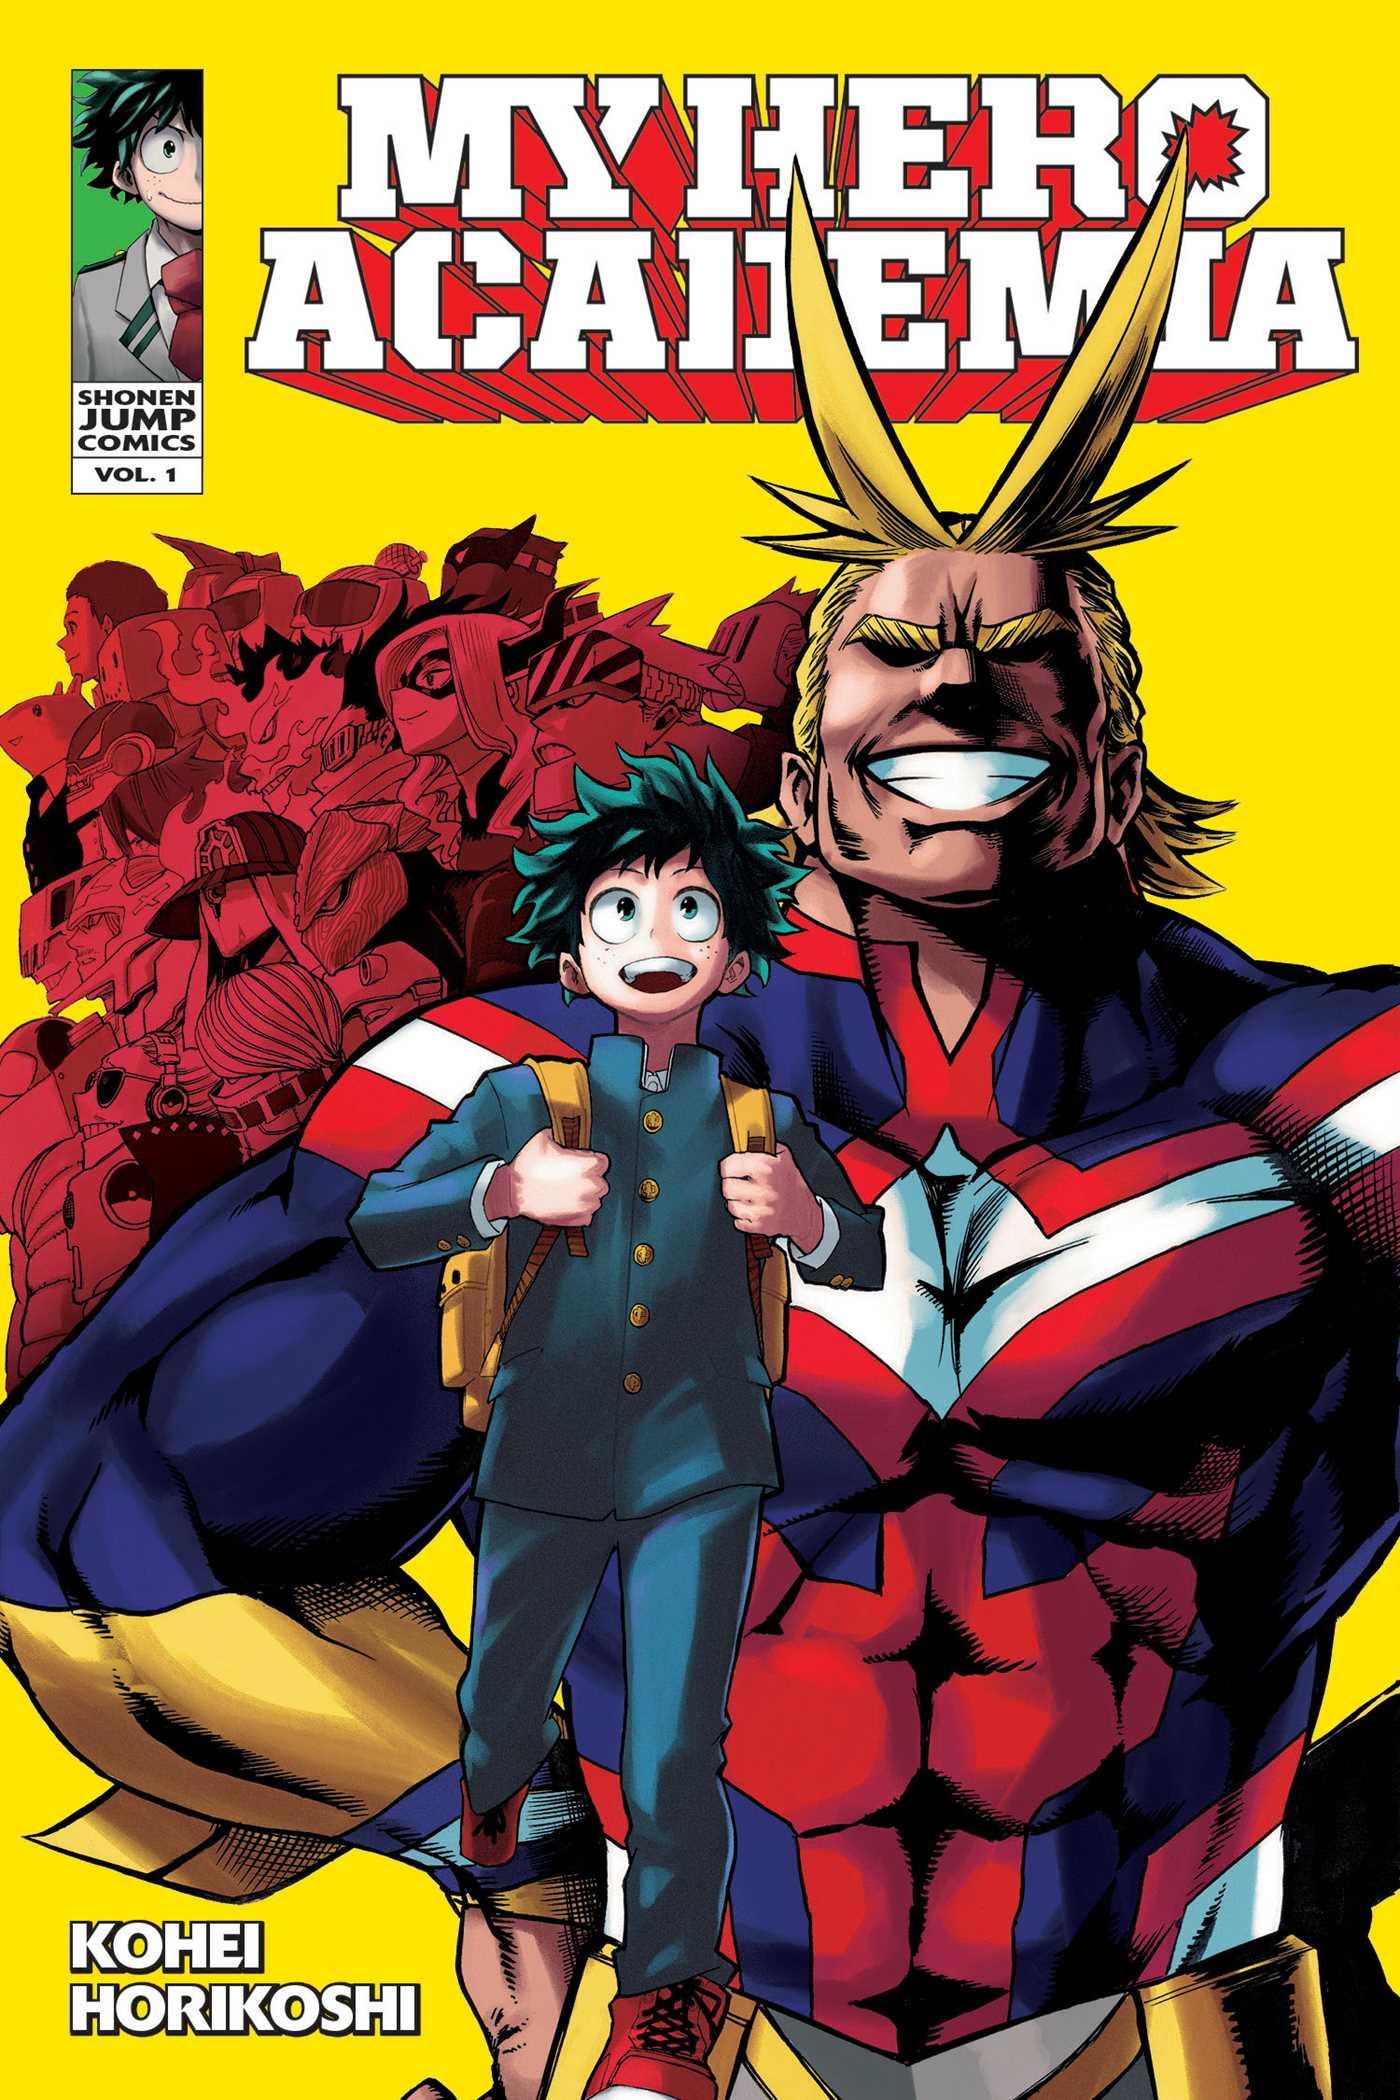 copertina my-hero-academia-vol-1-9781421582696_hr